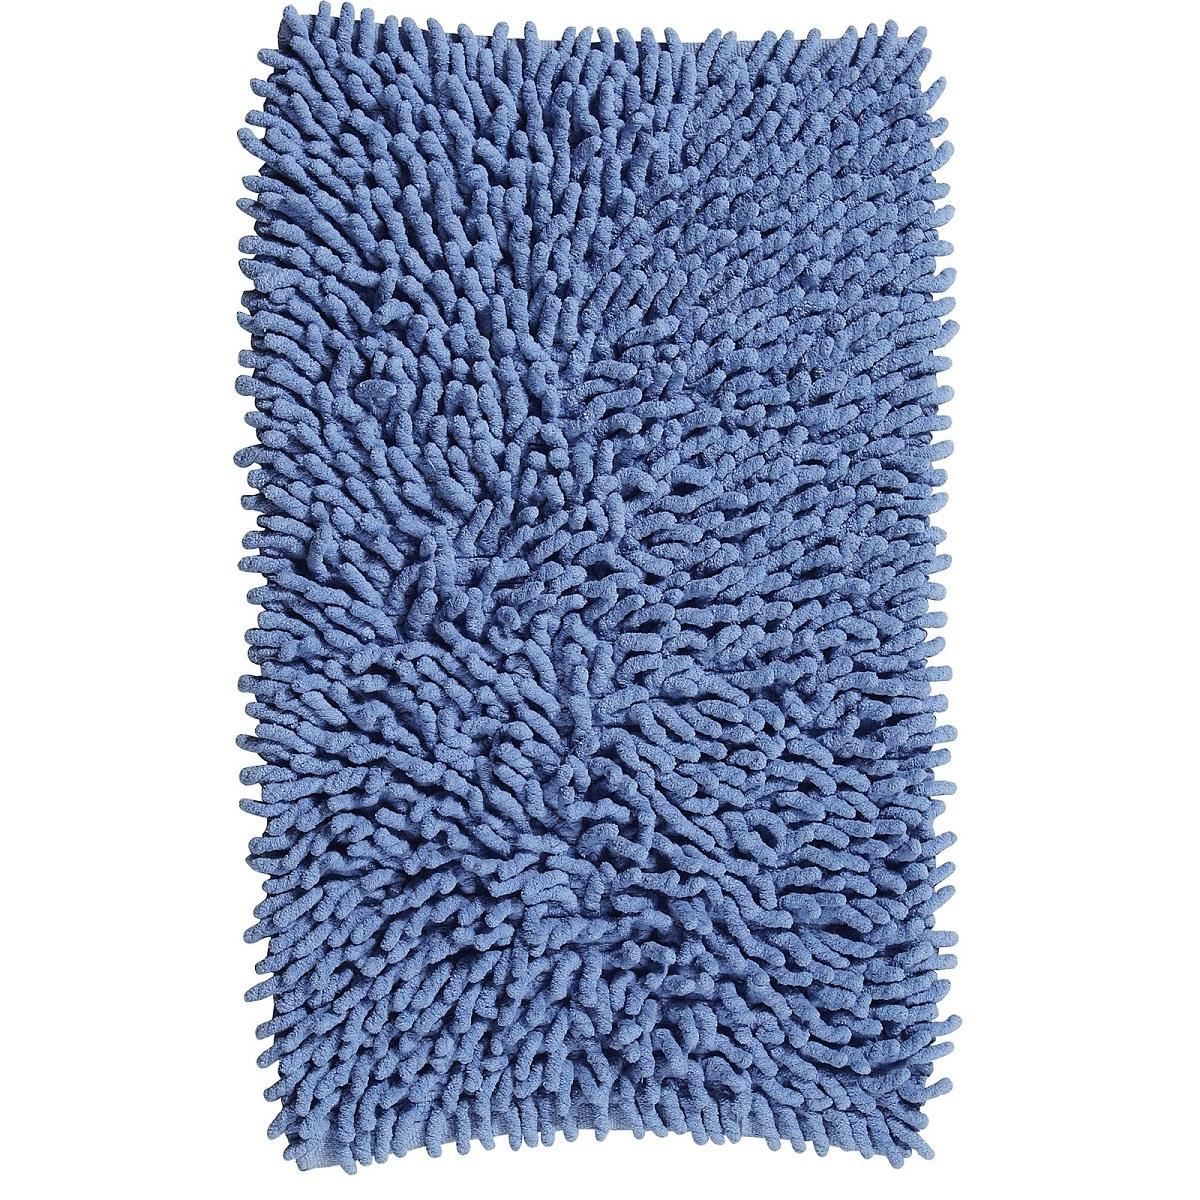 Коврики для ванной Элитный коврик для ванной Basics Blue от Kassatex elitnyy-kovrik-dlya-vannoy-basics-blue-ot-kassatex-portugaliya.jpg